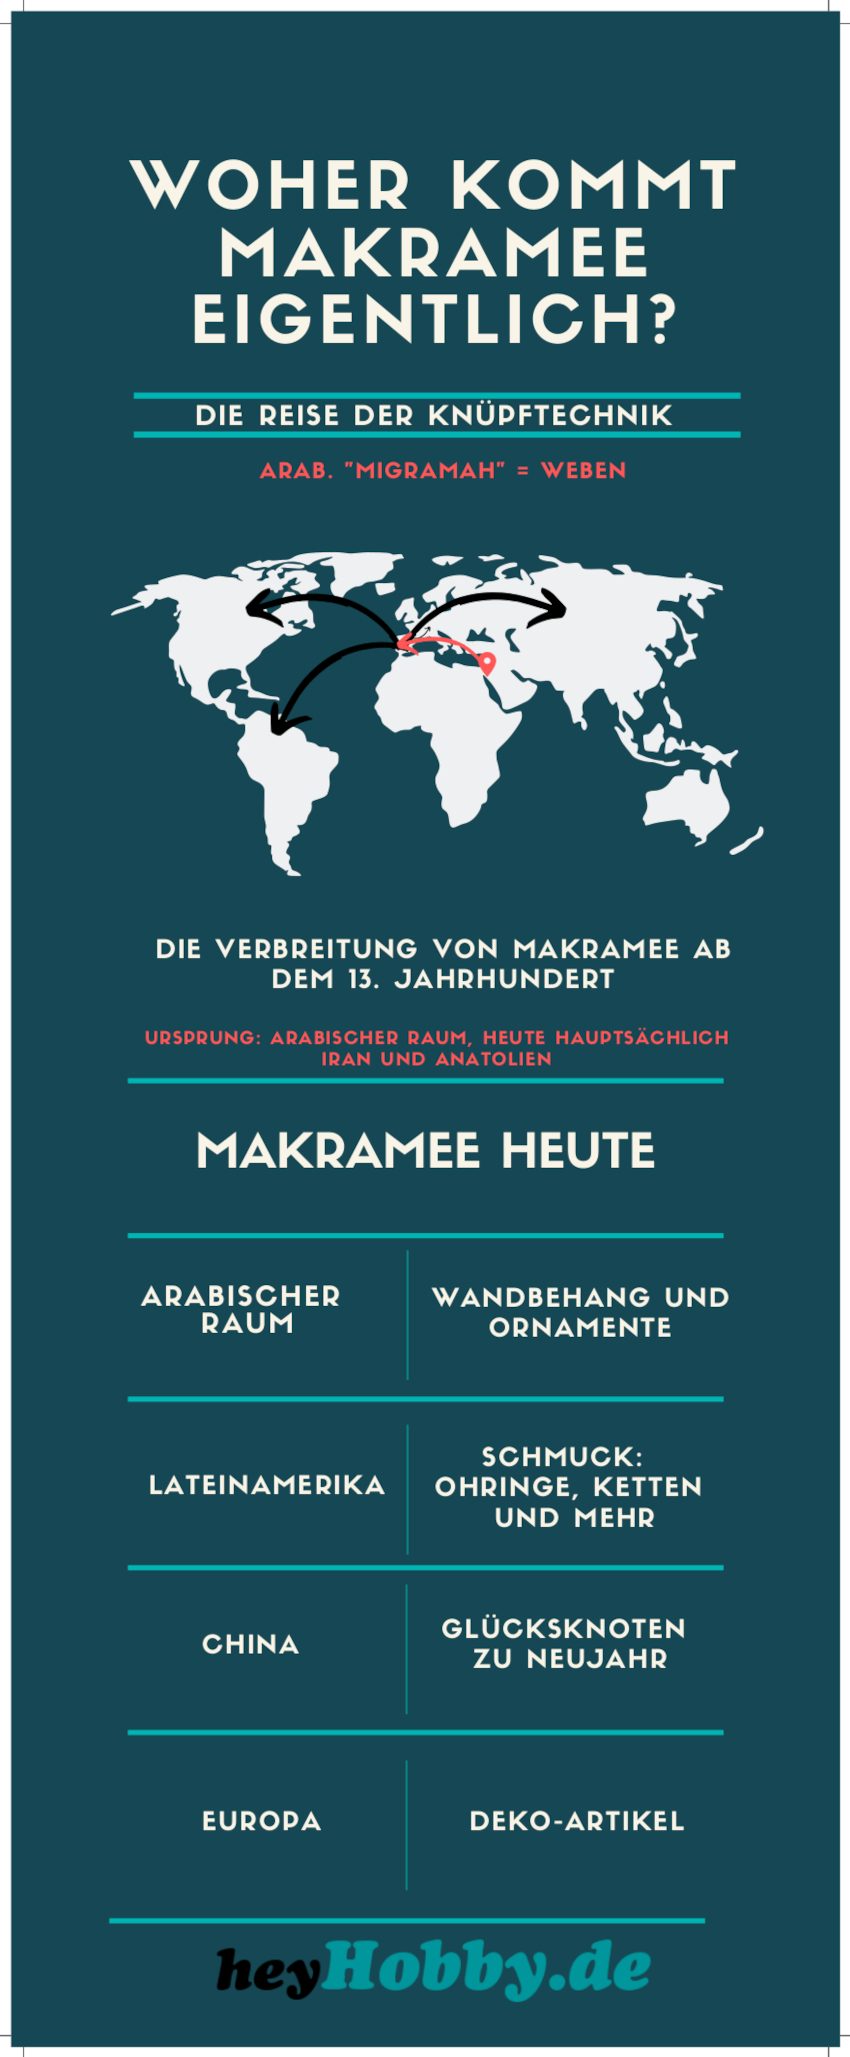 Infografik zur Geschichte des Makramee